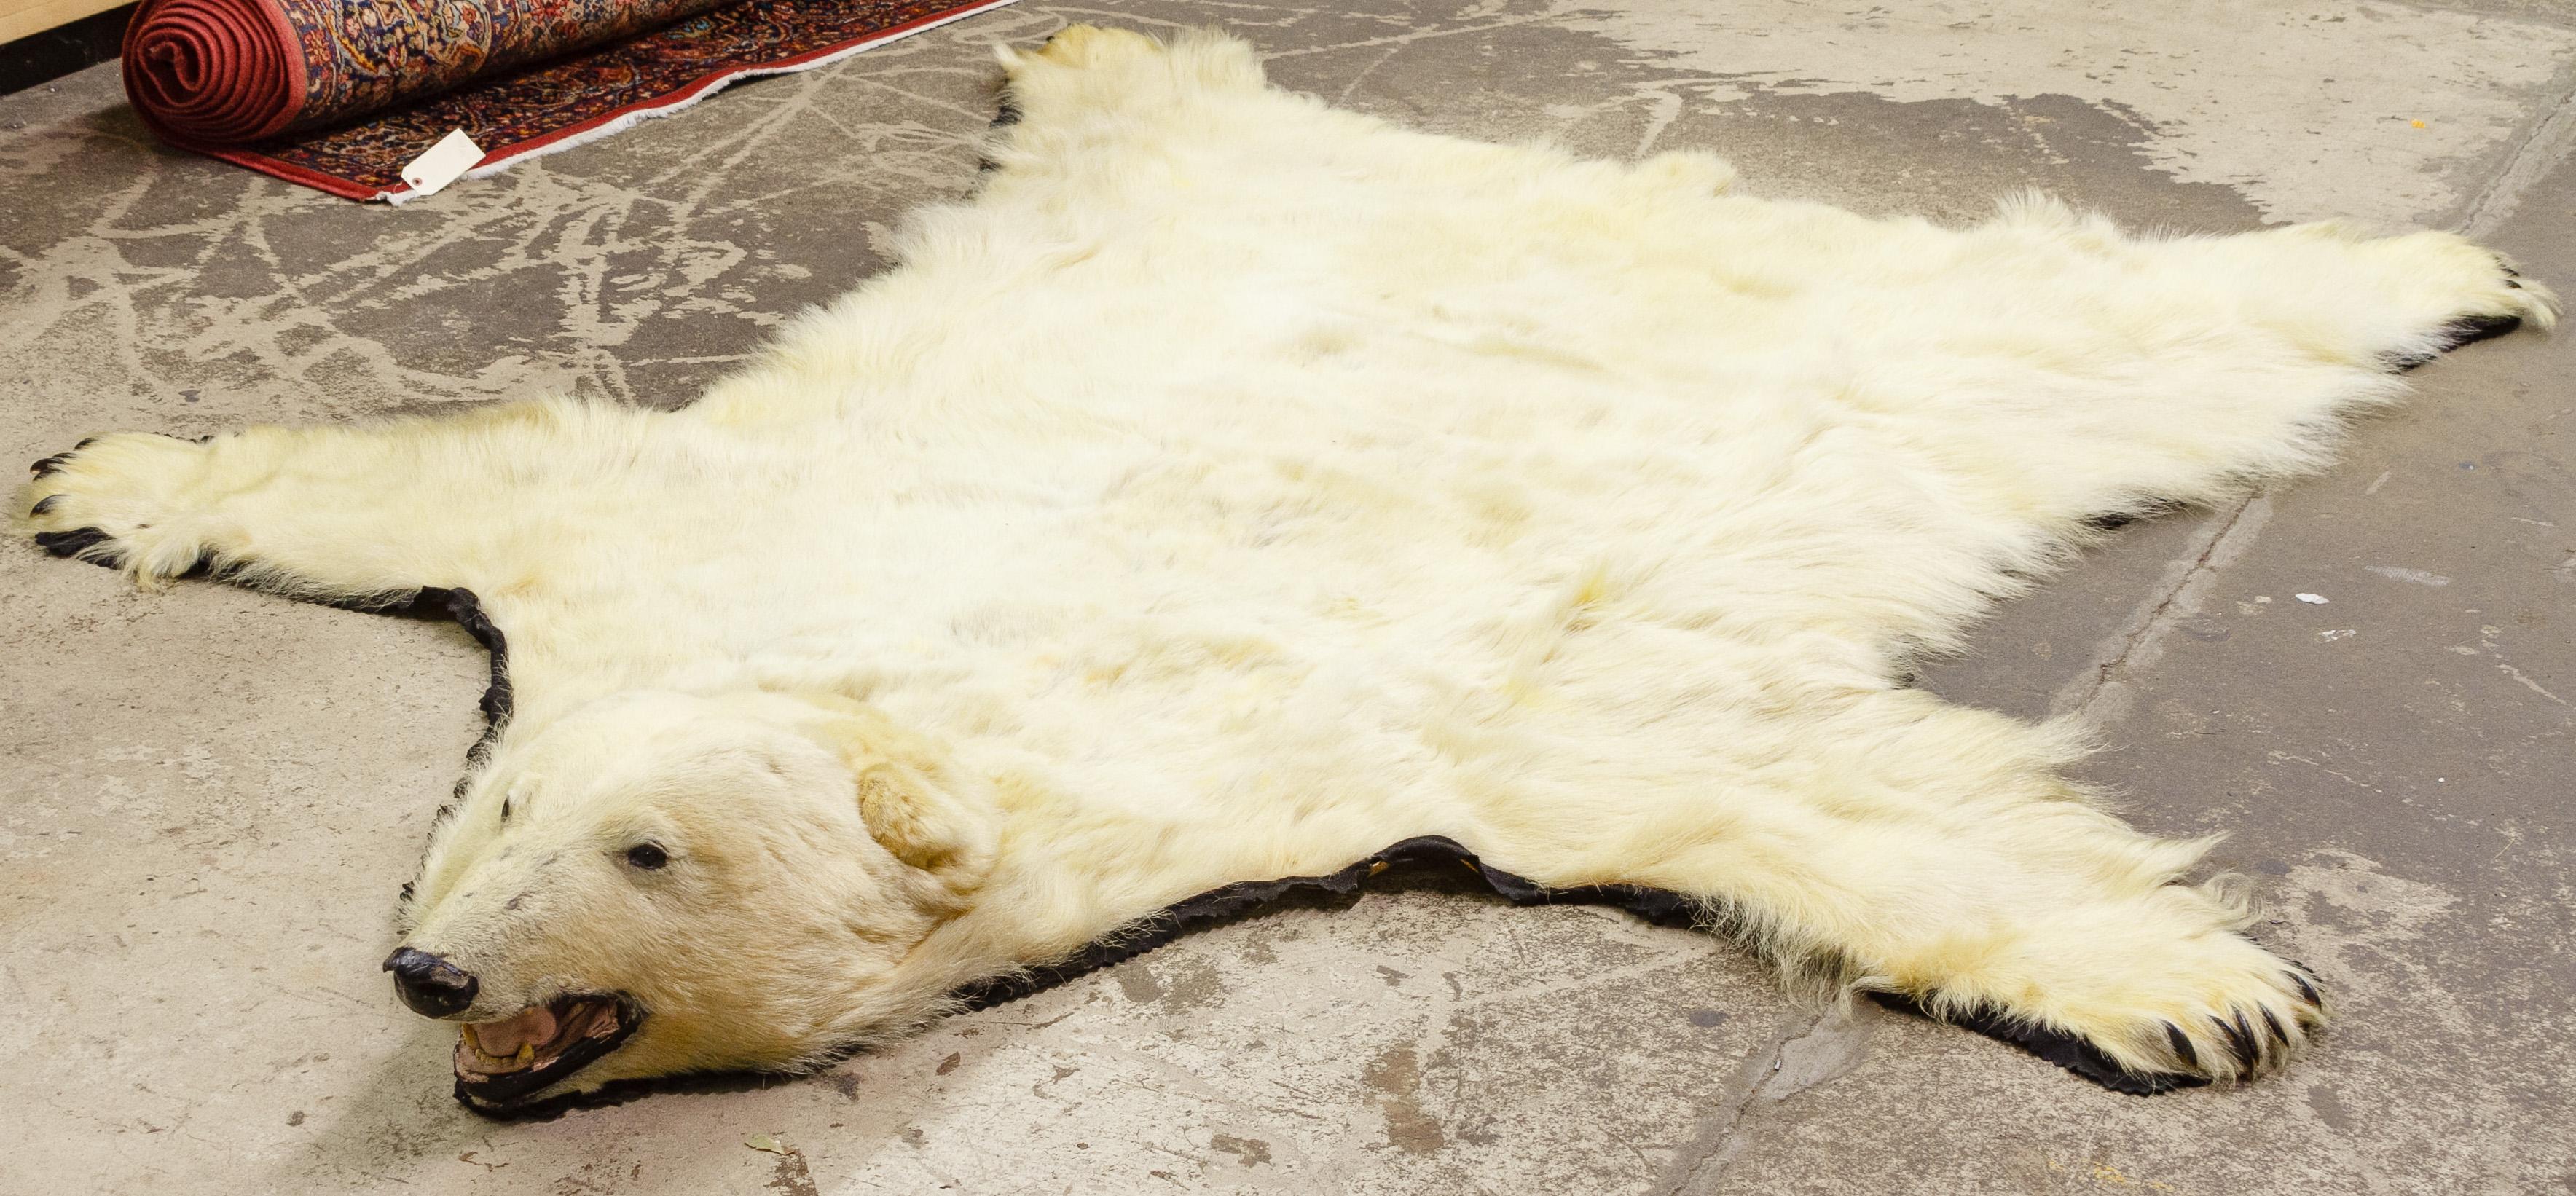 Polar Bear Rug - Oct 16, 2016 | Leonard